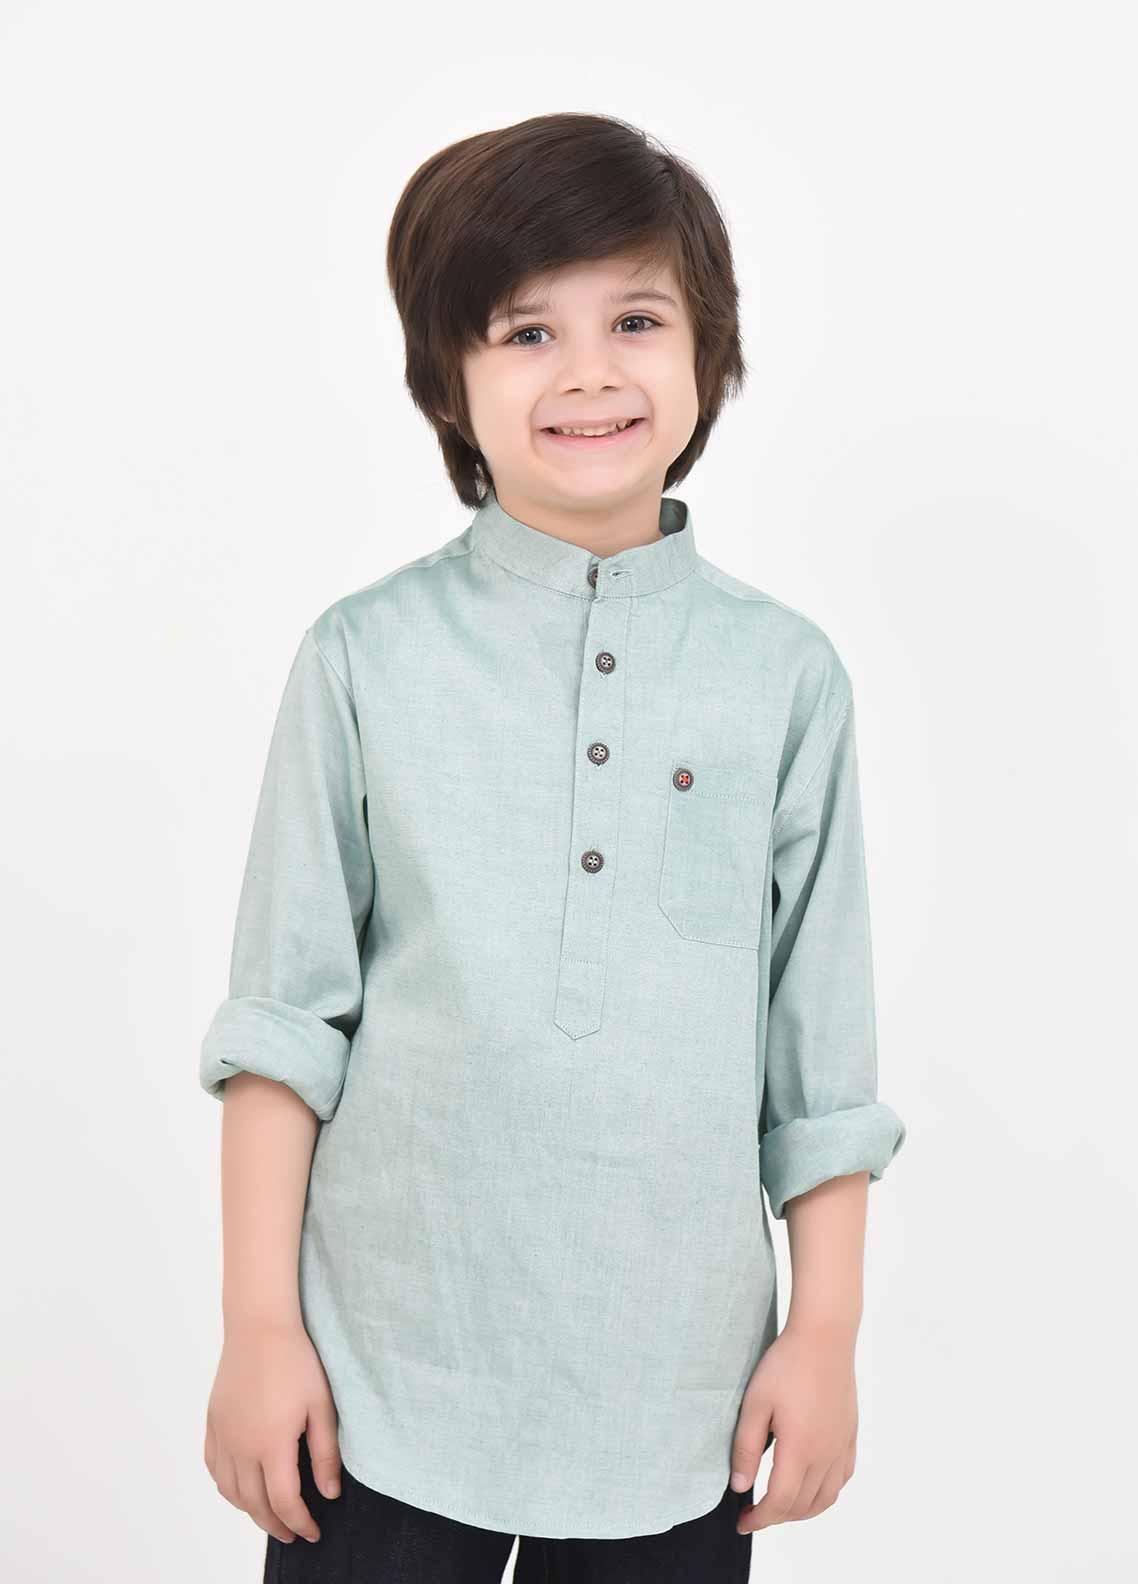 Ochre Cotton Casual Boys Shirts -  OBS 11 Light Green